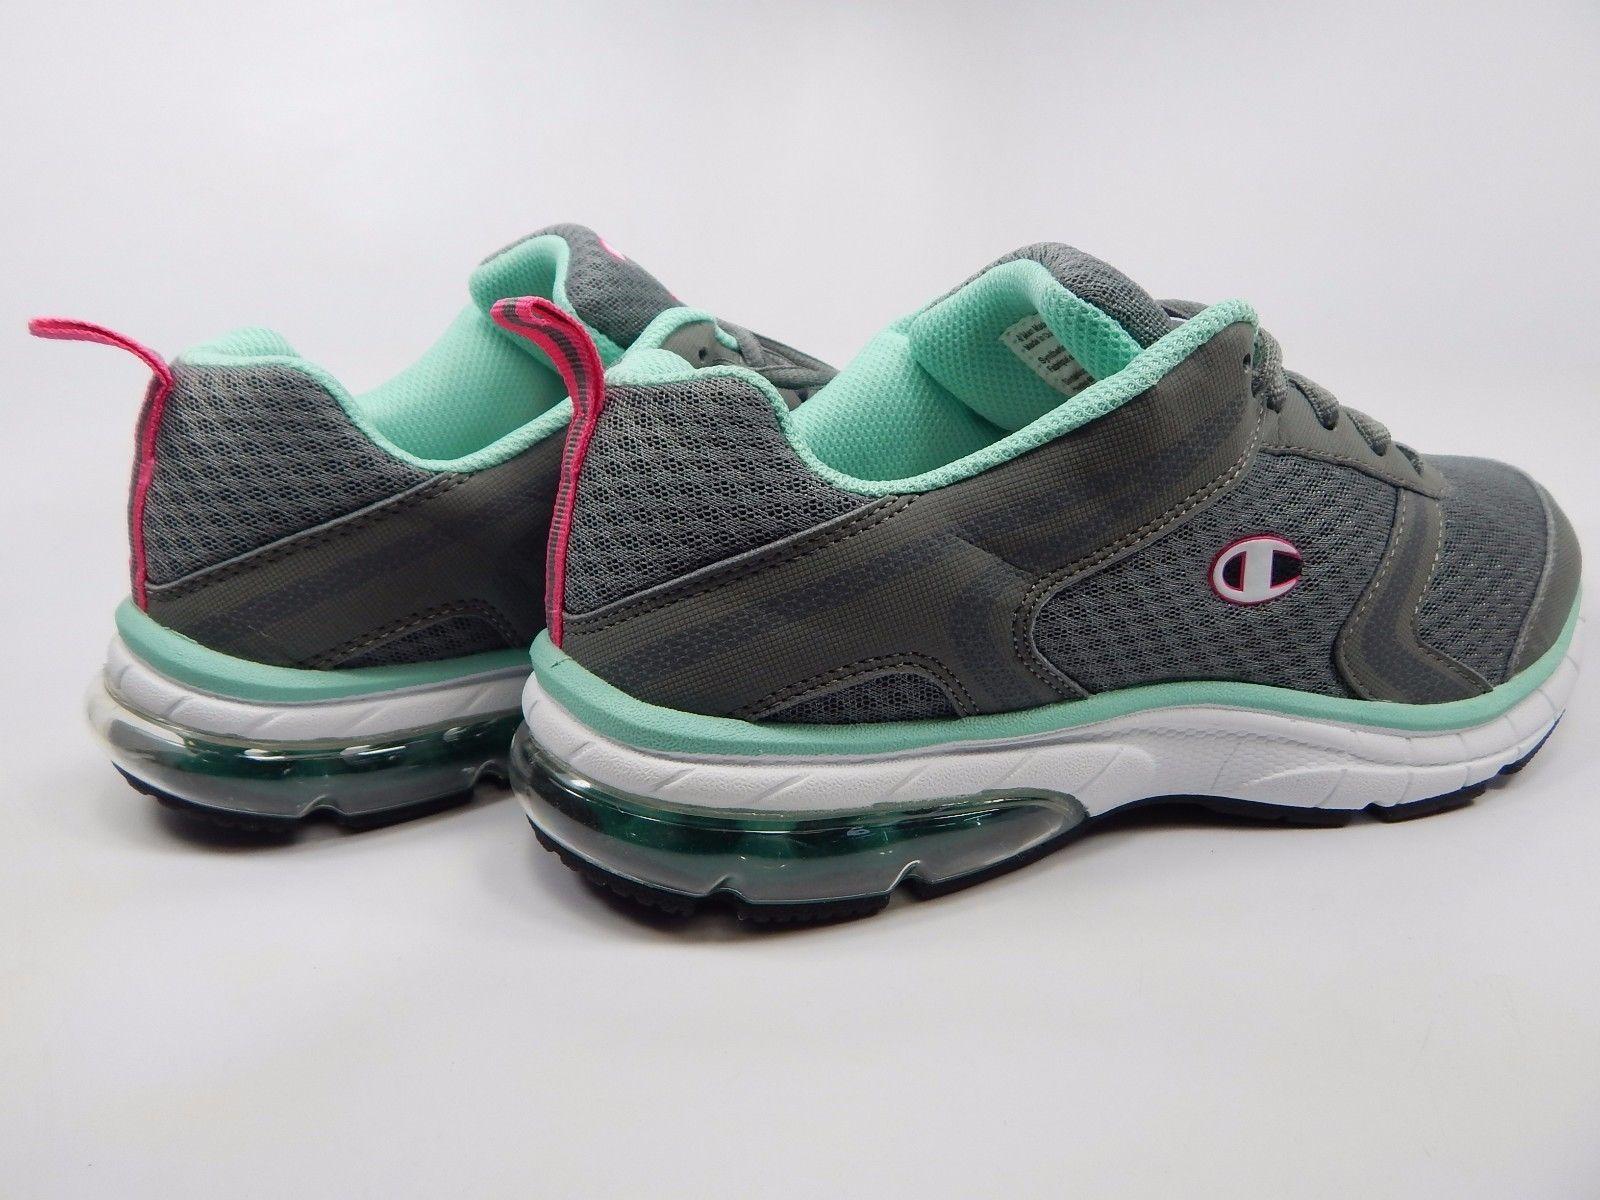 Champion Air Max Memory Foam Women's Running Shoes Size US 10 M (B) EU 42.5 Gray